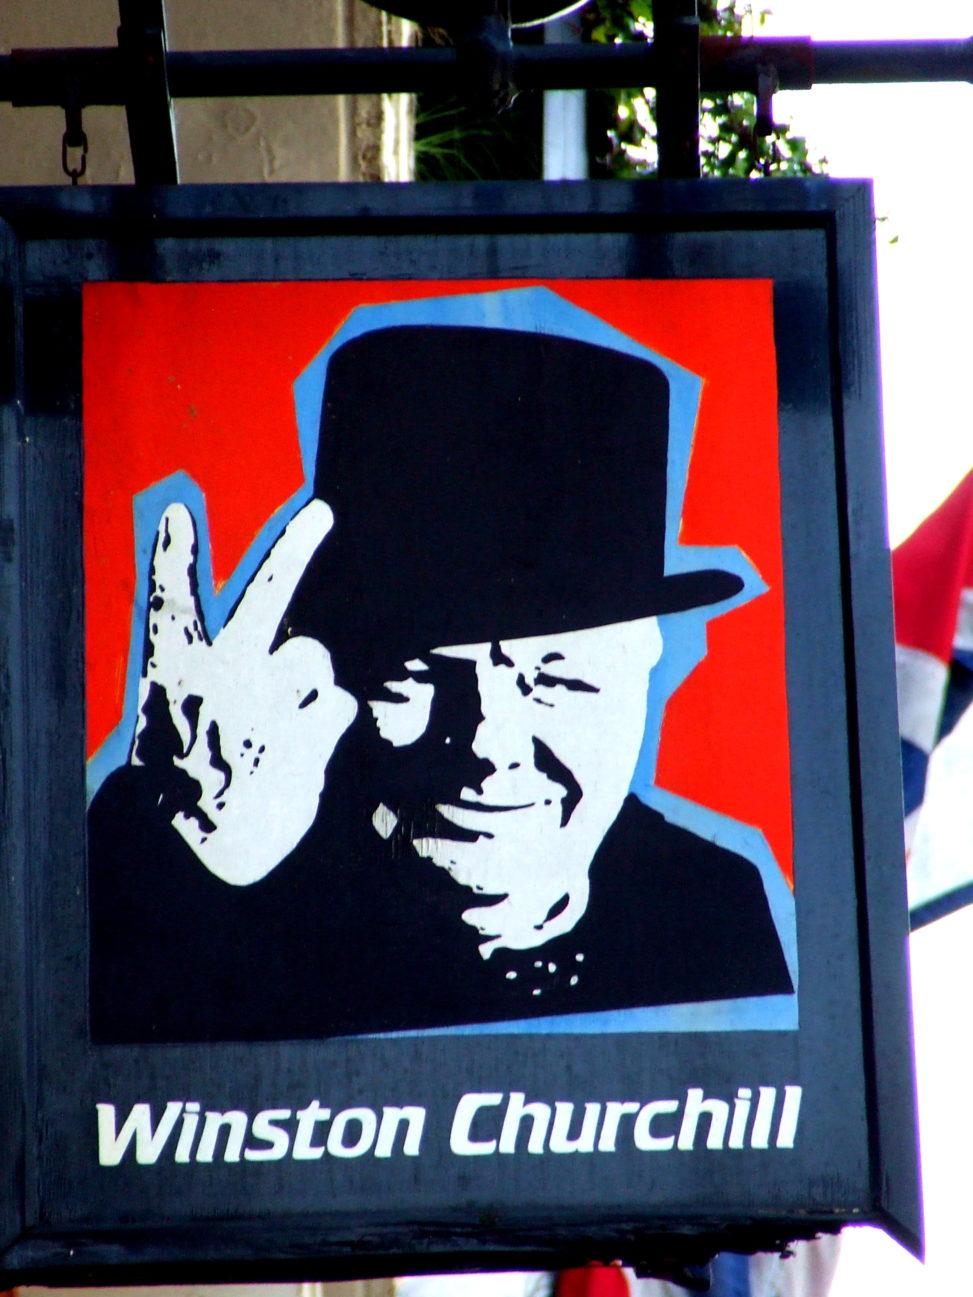 Winston Churchill Pub sign